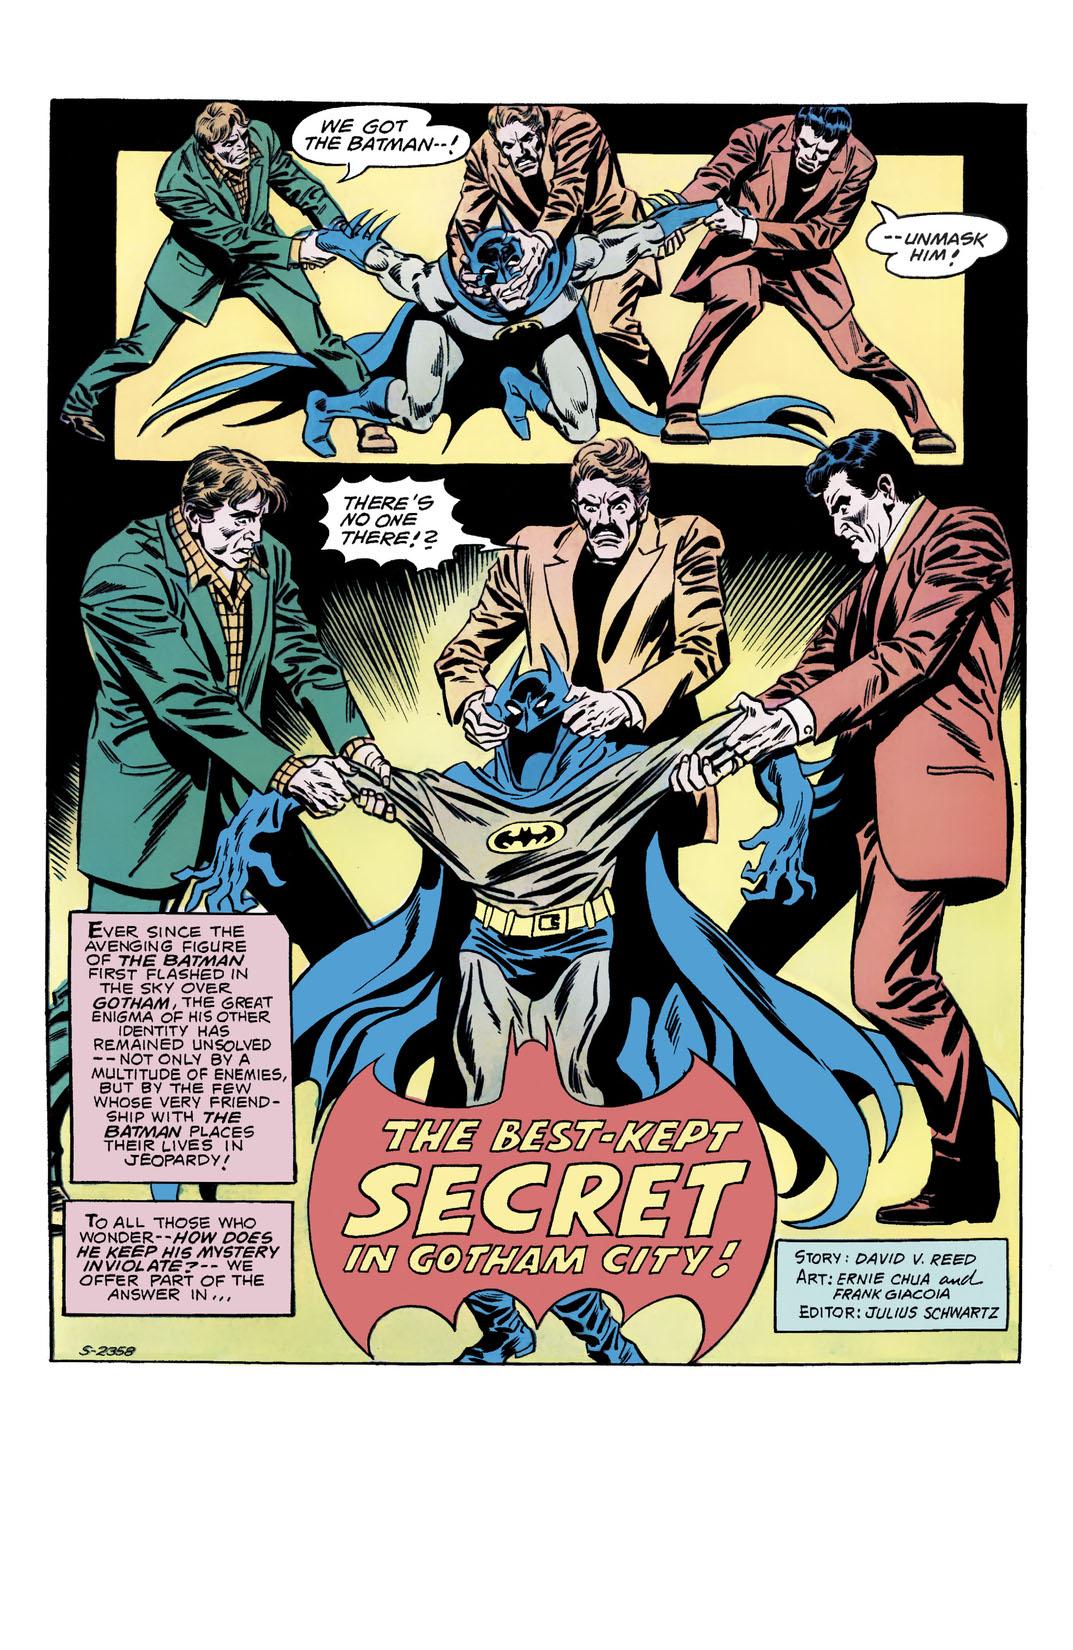 Read Detective Comics (1937-) #465 on DC Universe